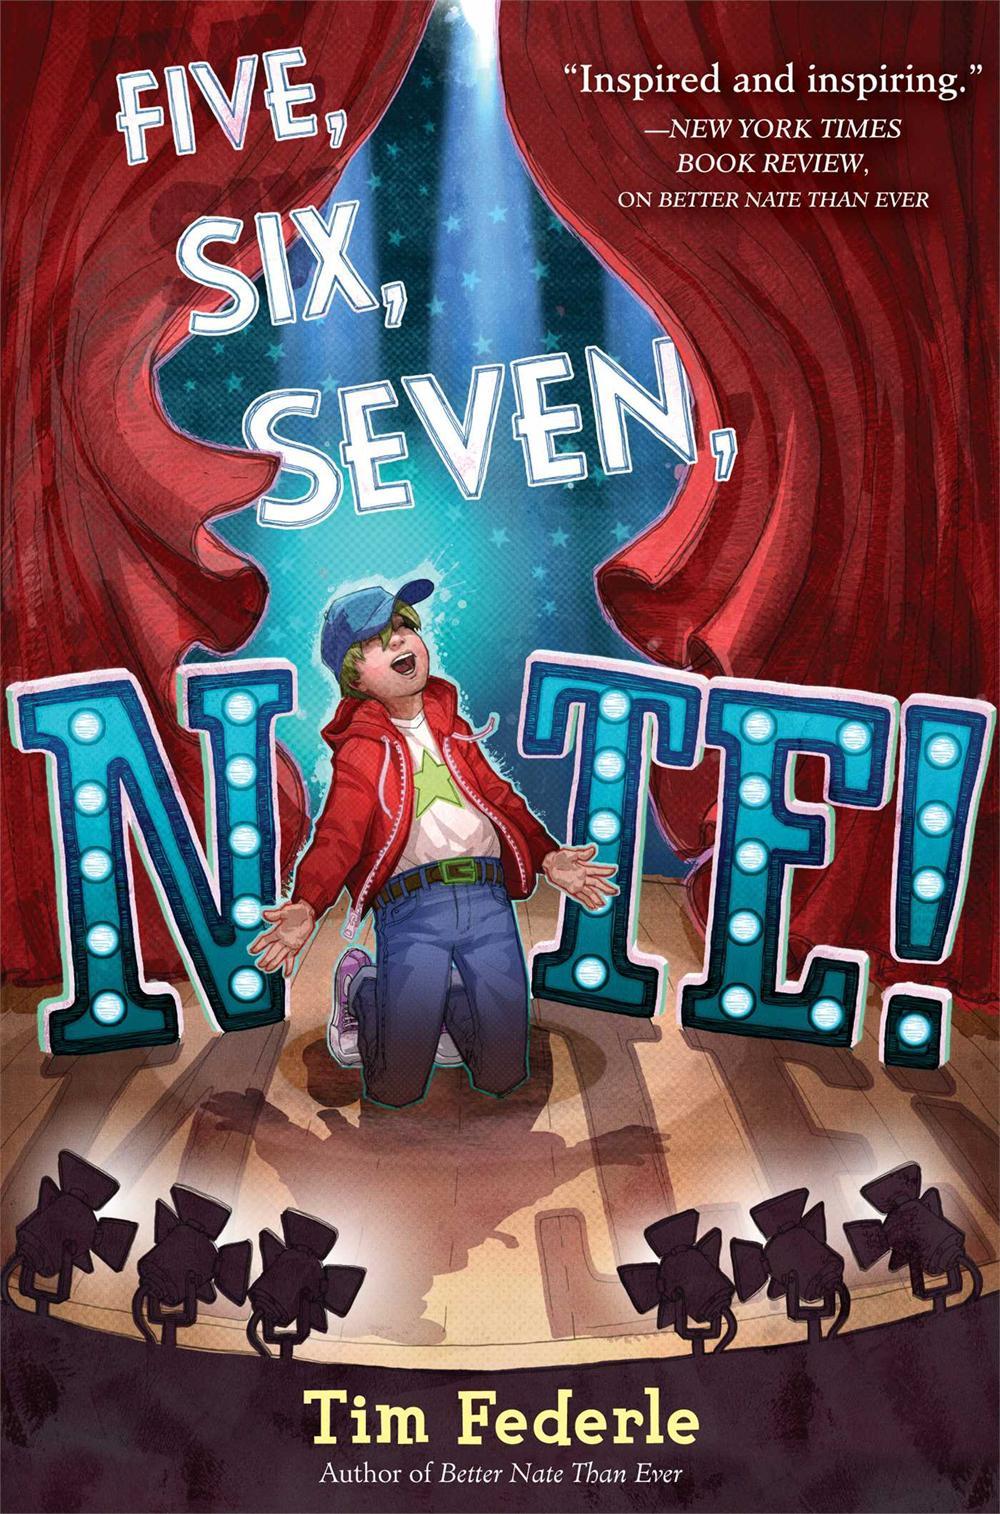 Five, Six Seven, Nate!